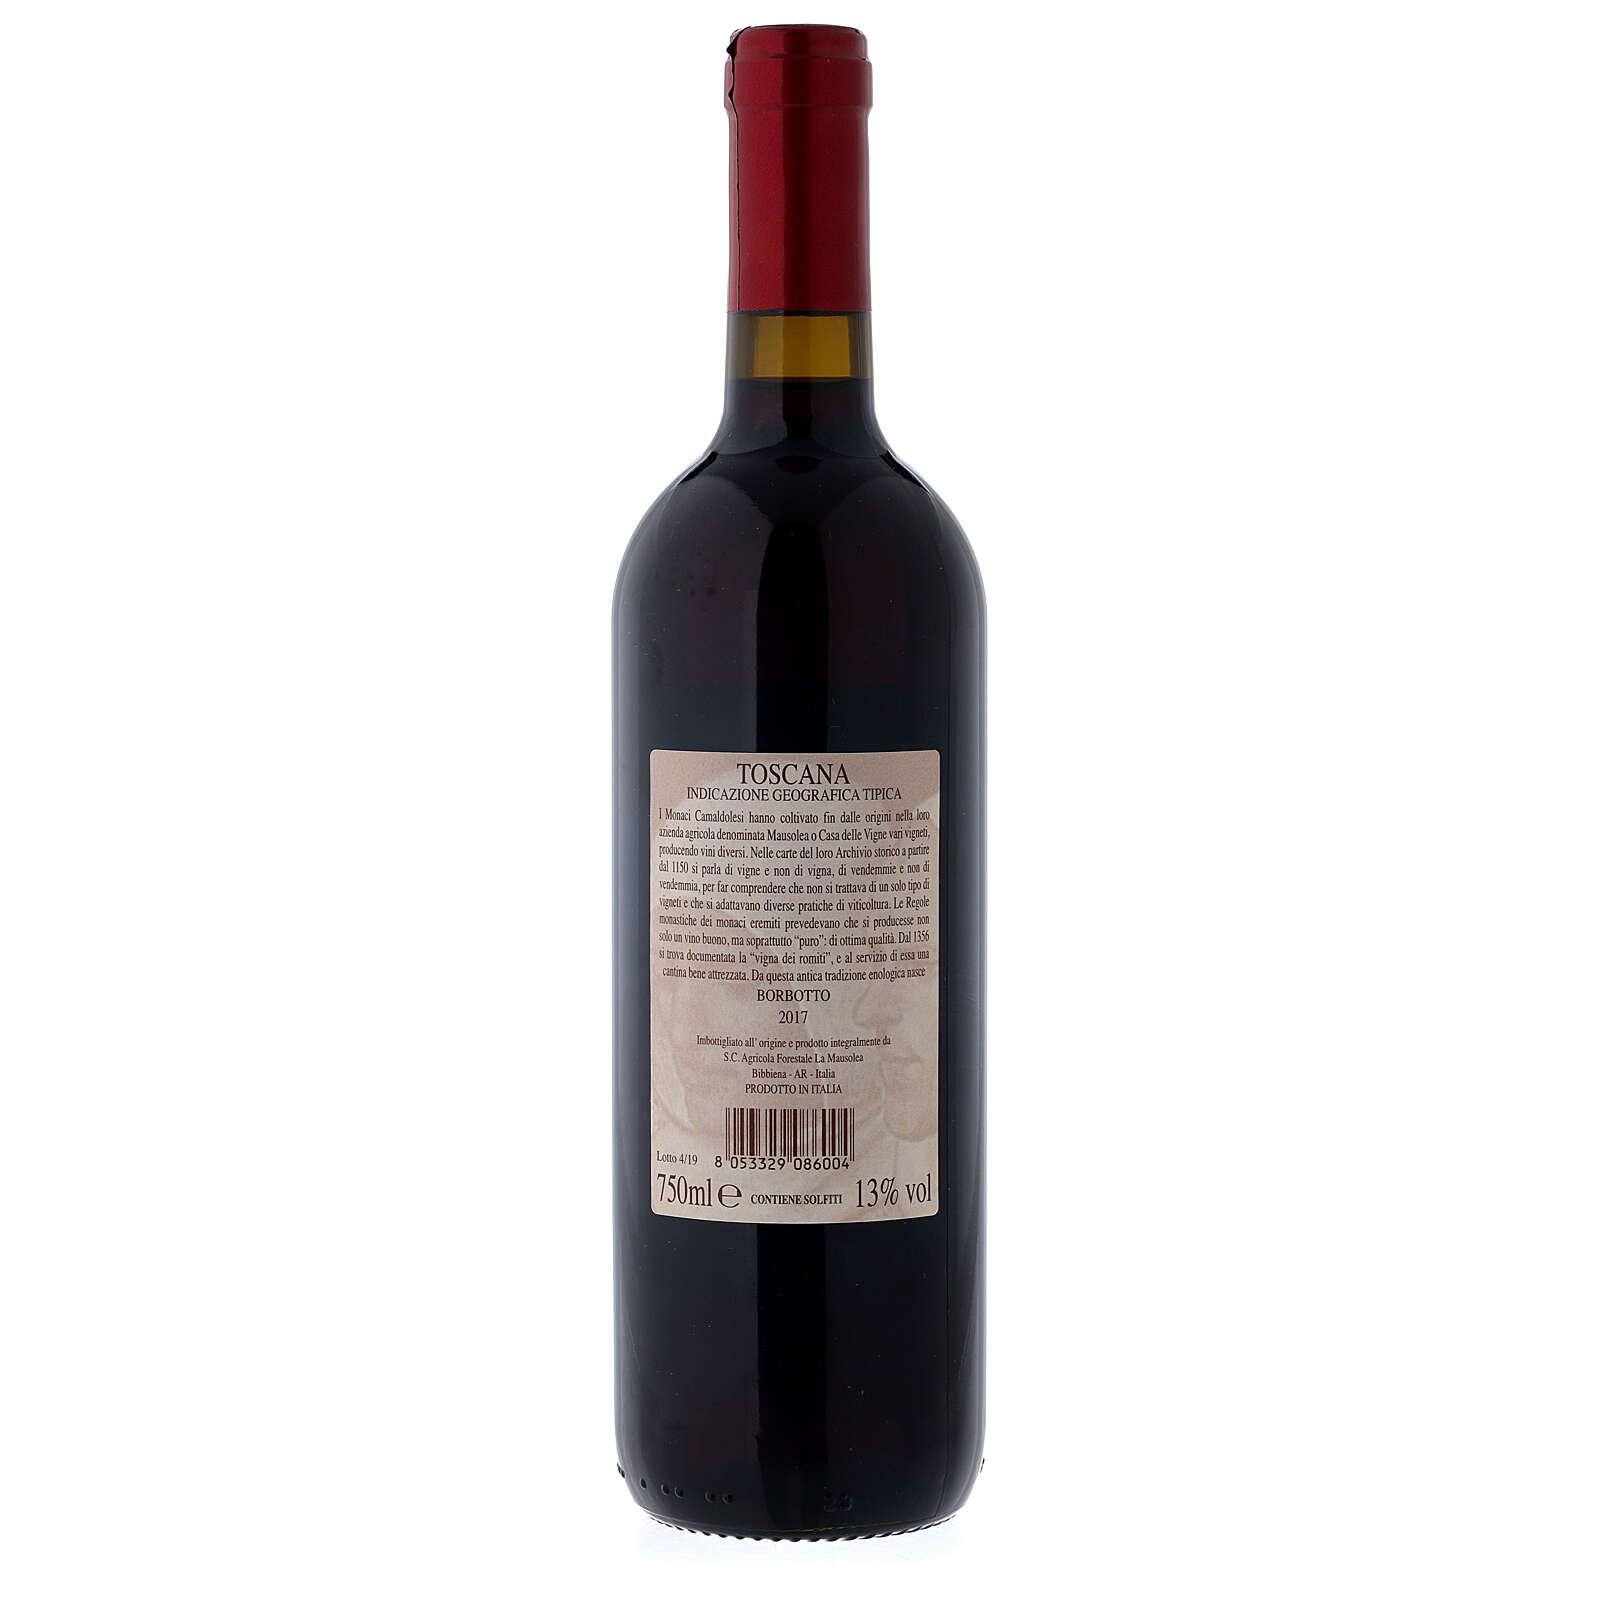 Camaldoli Bordotto red wine from Tuscany 750 ml 2017 3